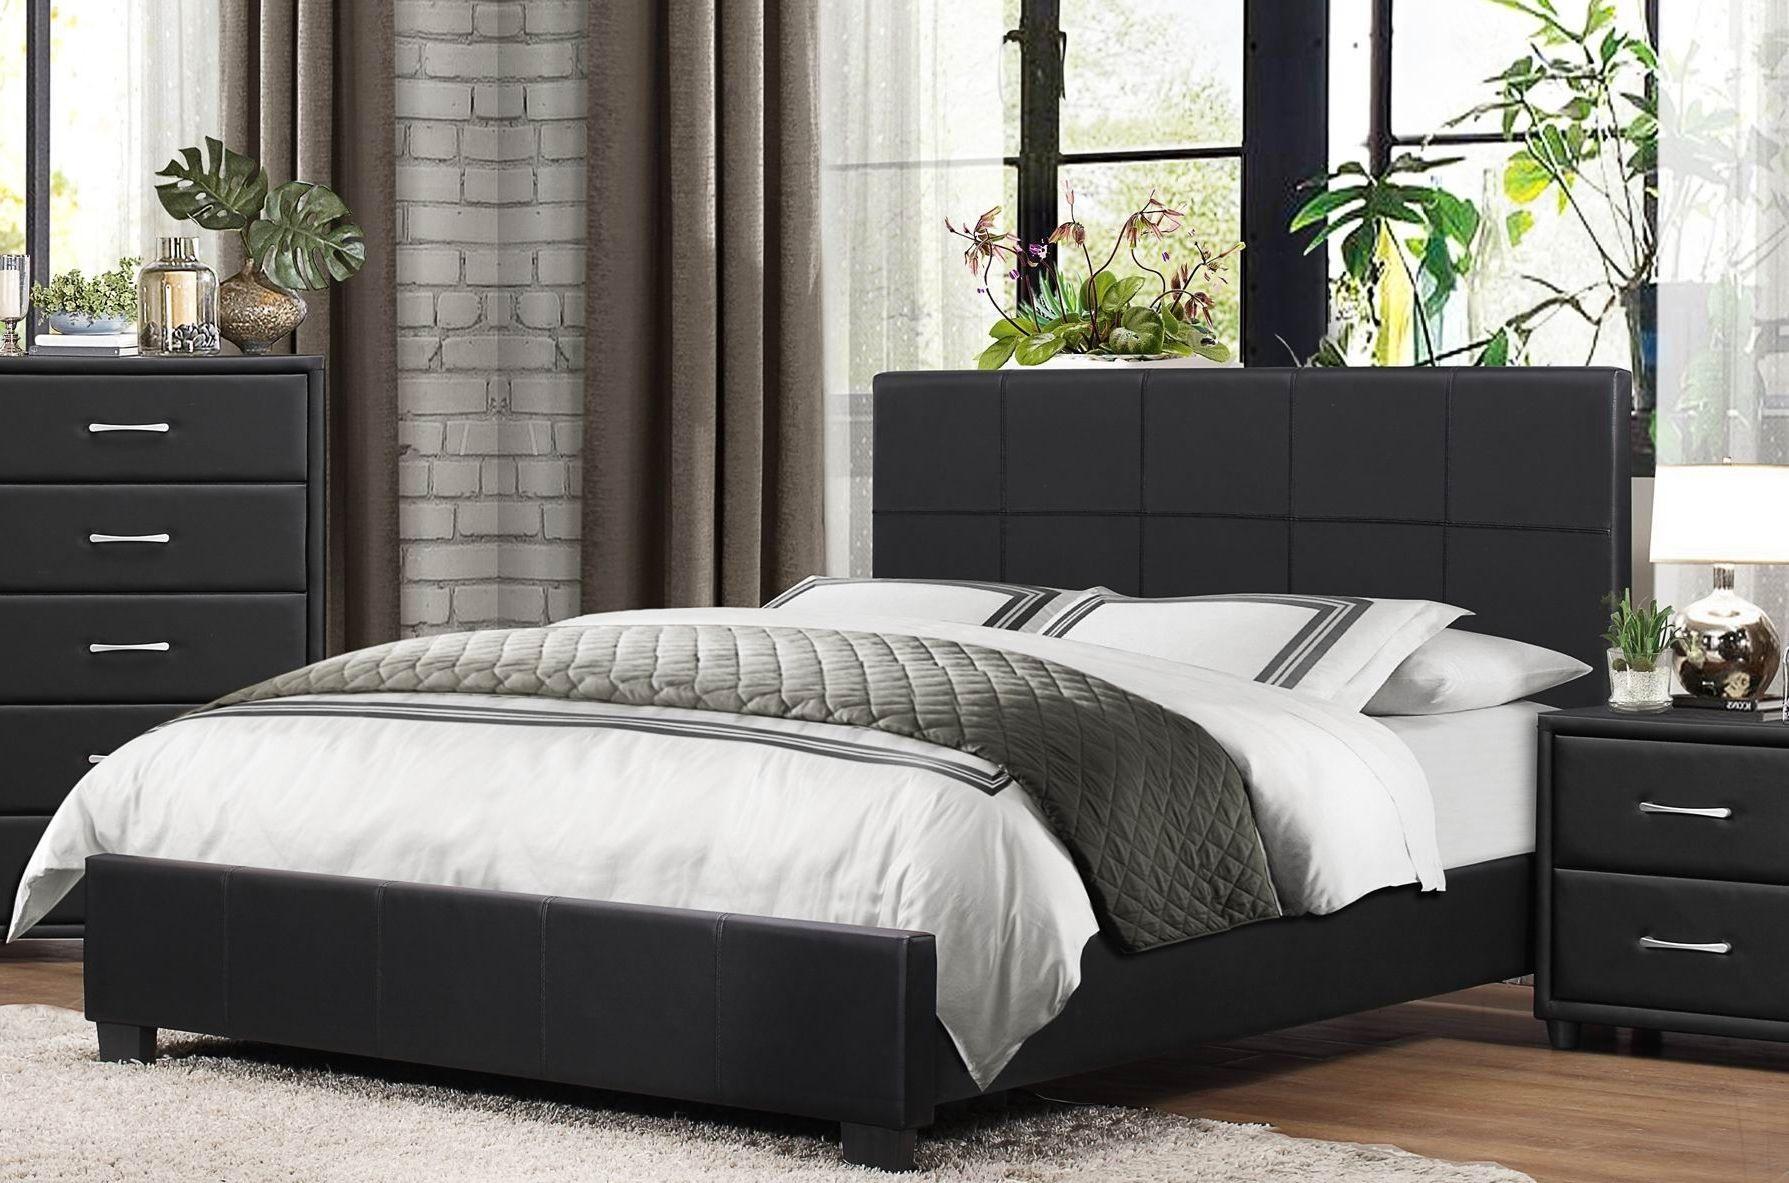 Lorenzi Black Queen Upholstered Platform Bed From